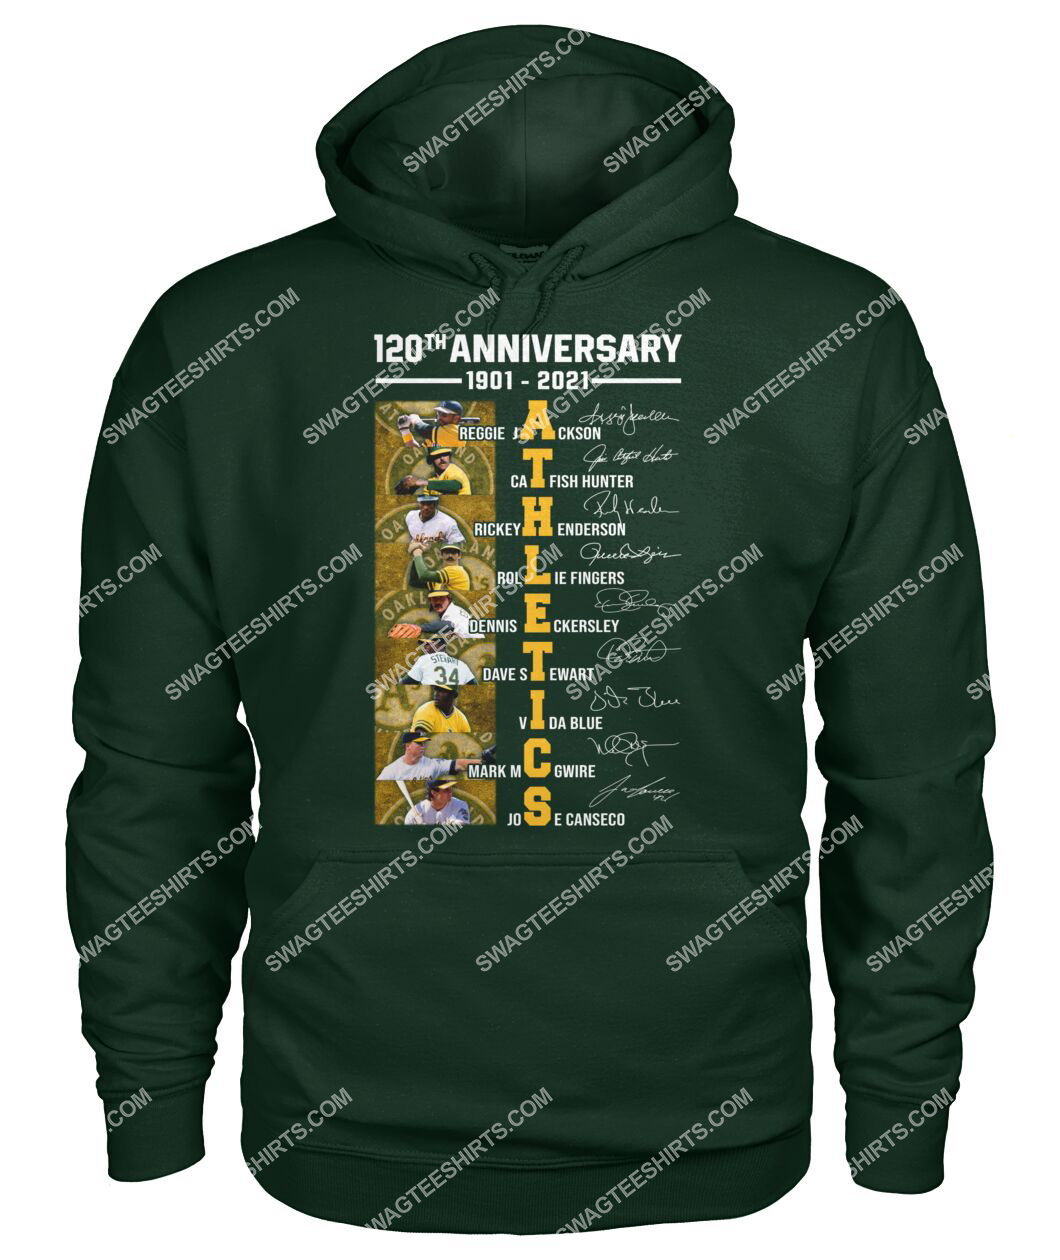 the oakland athletics 120th anniversary 1901 2021 signatures mlb hoodie 1